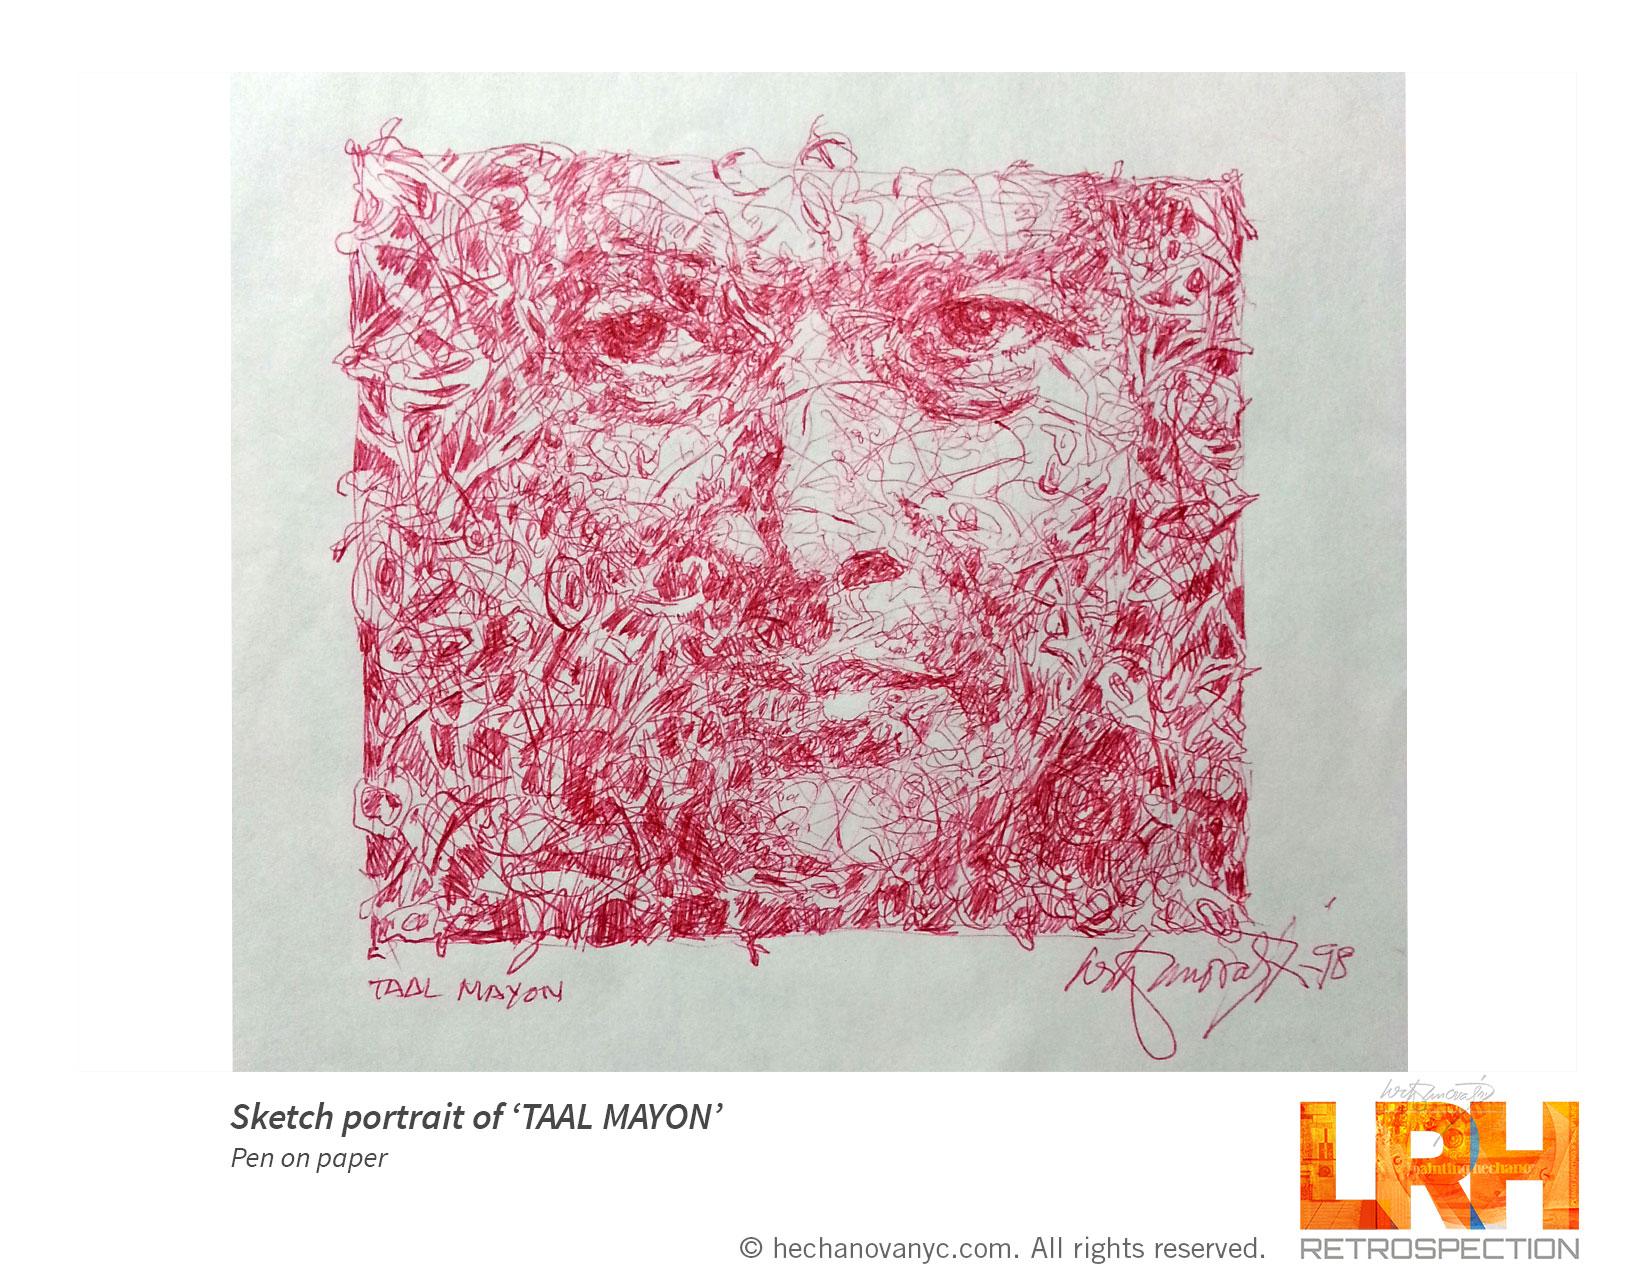 Sketch Portrait 'TAAL MAYON'